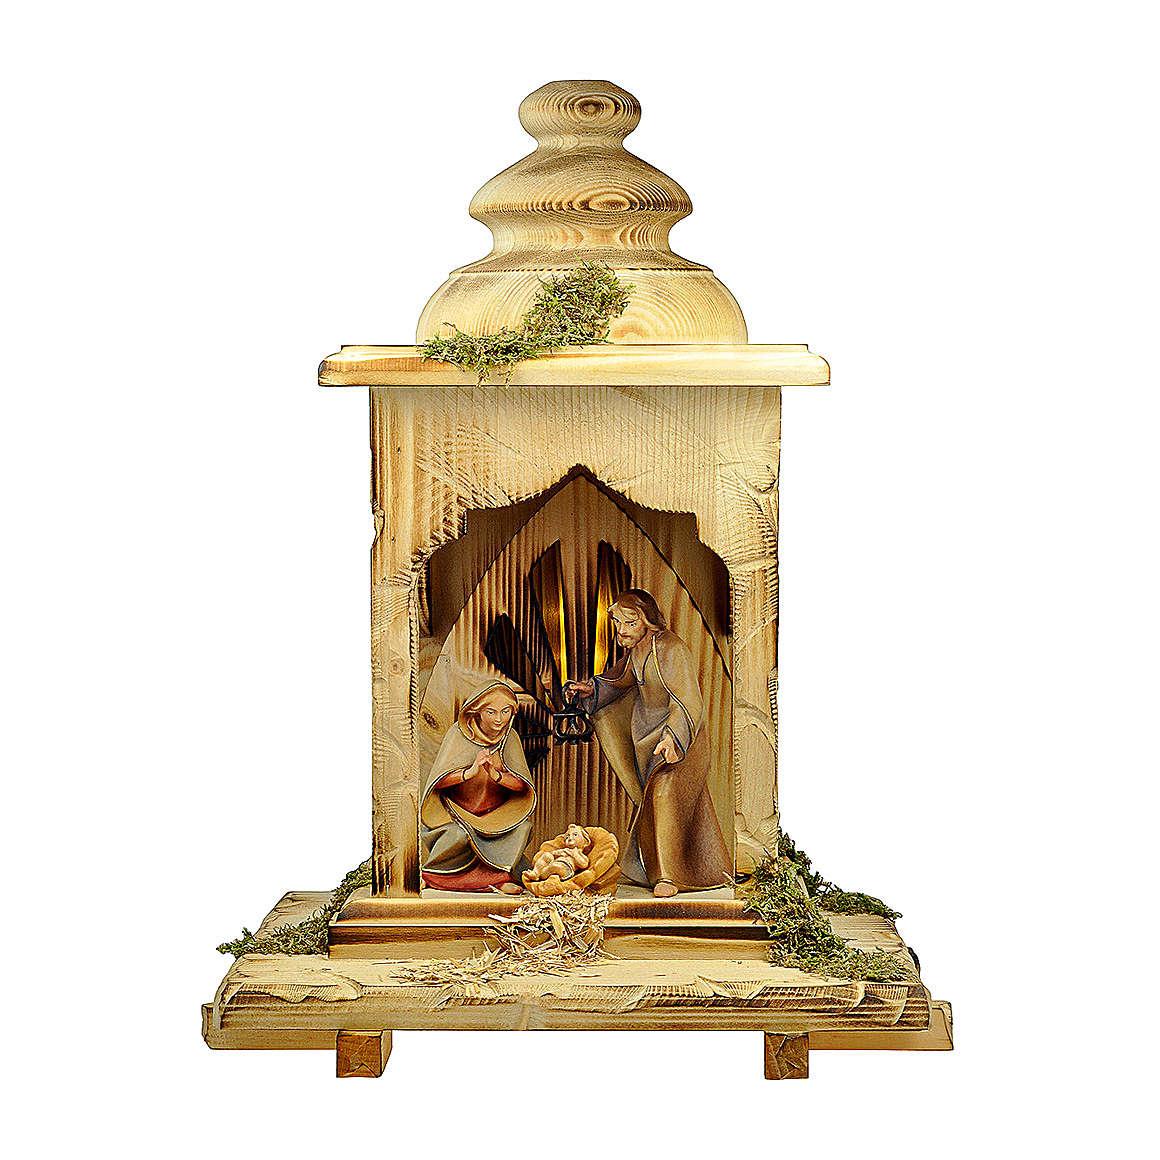 Sacra famiglia nella lanterna con luce presepe Original Redentore legno dipinto in Valgardena 12 cm 4